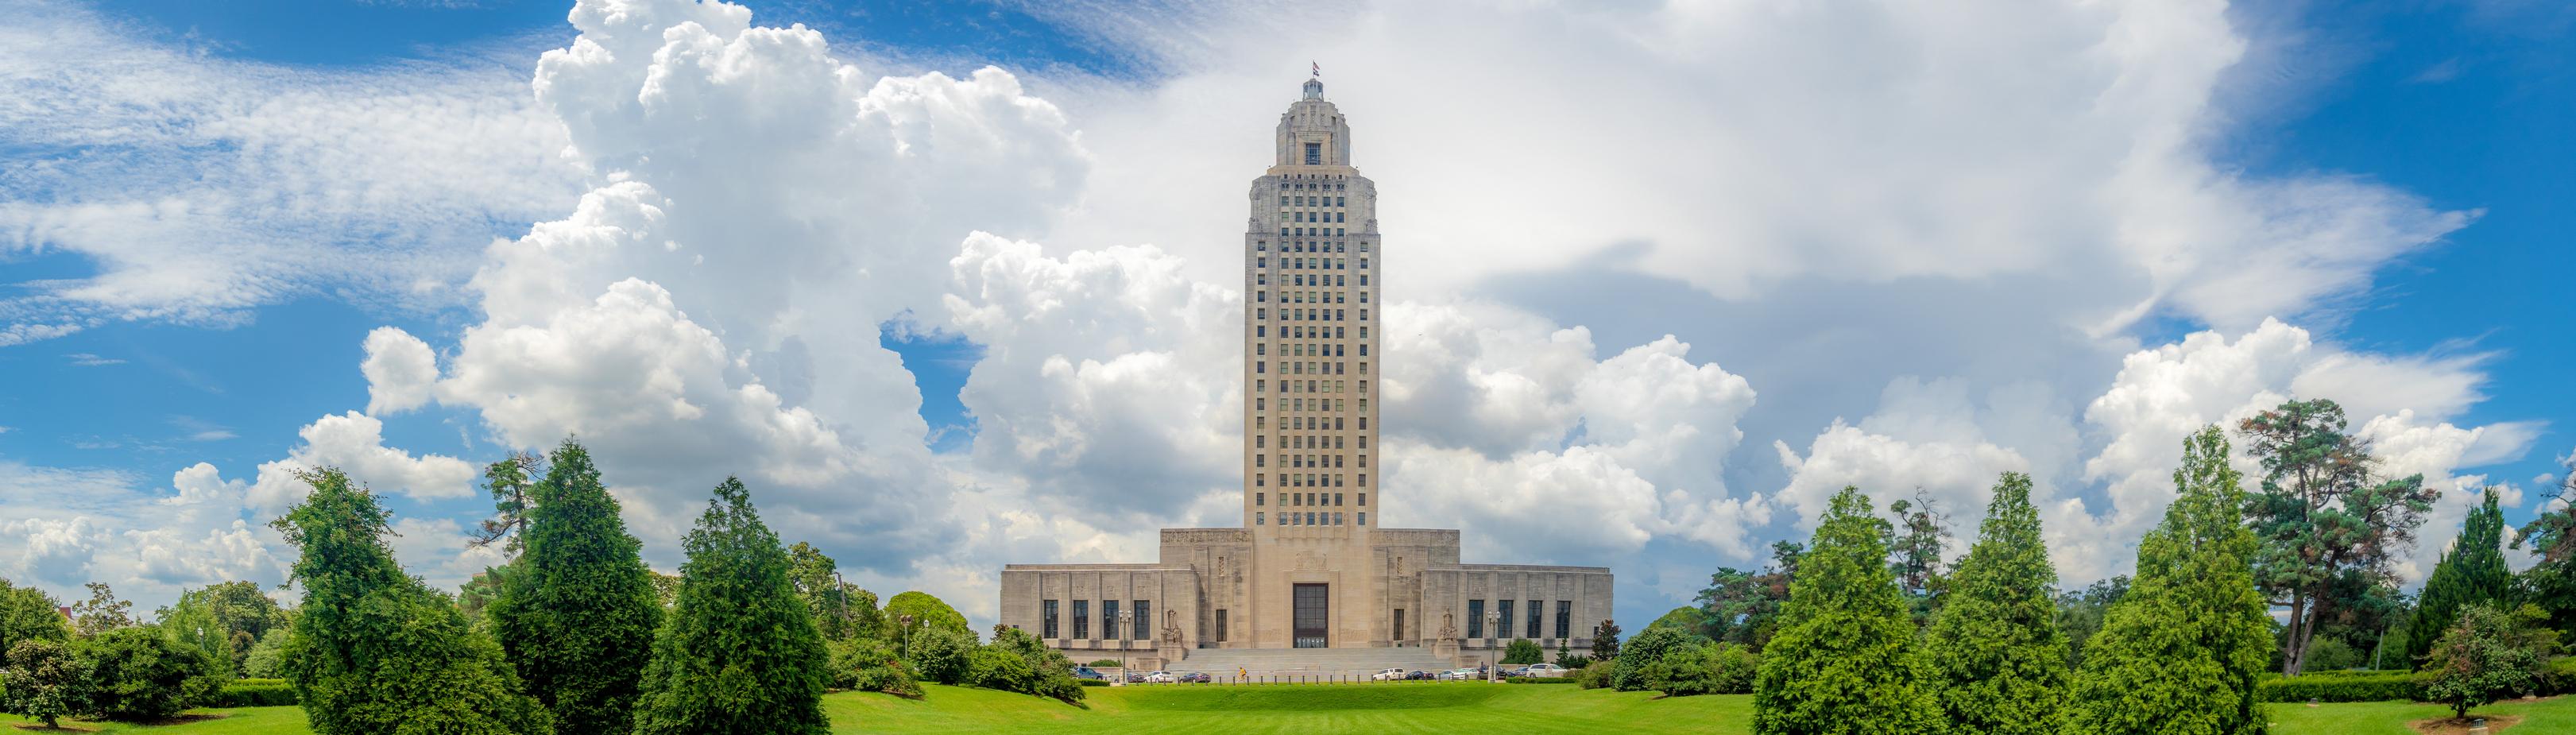 Baton Rouge Louisiana state capital